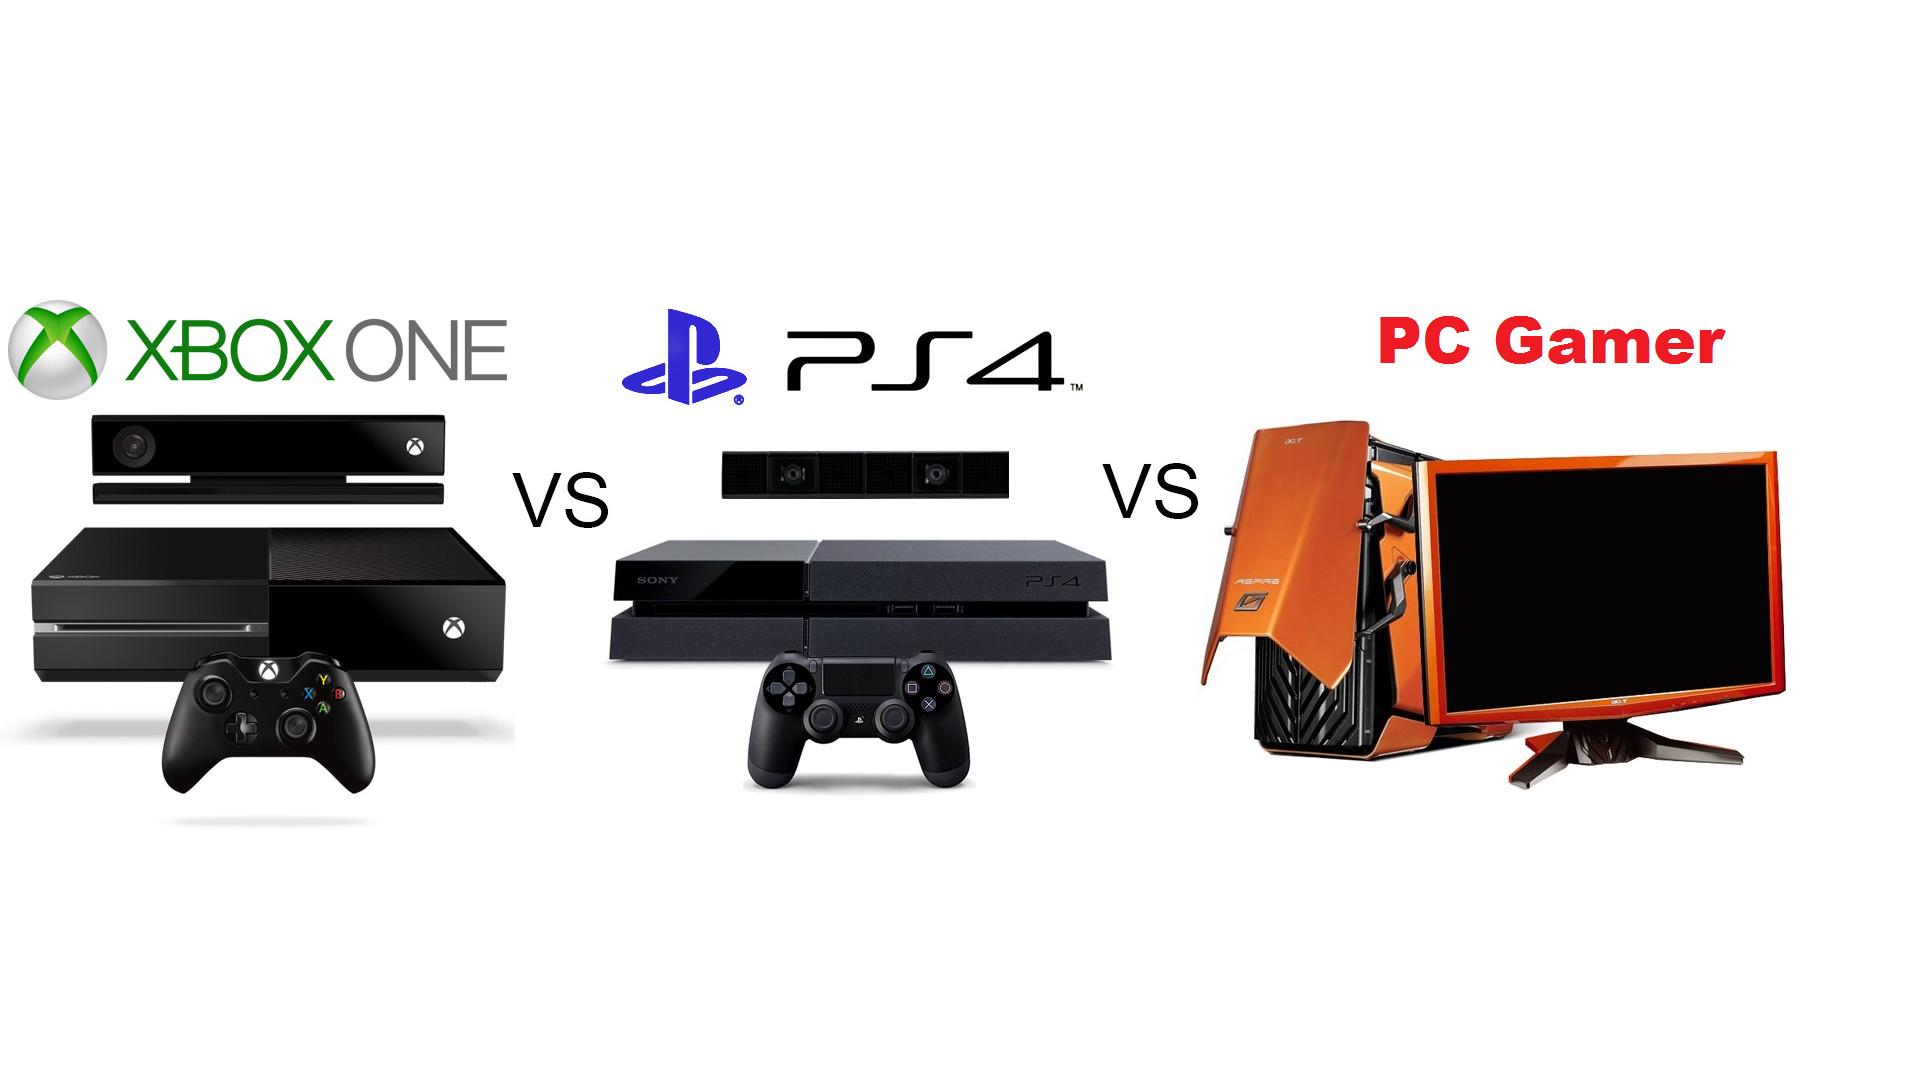 42e8d9c74 جميع مميزات وعيوب منصات الألعاب PC & Xbox One & PS4